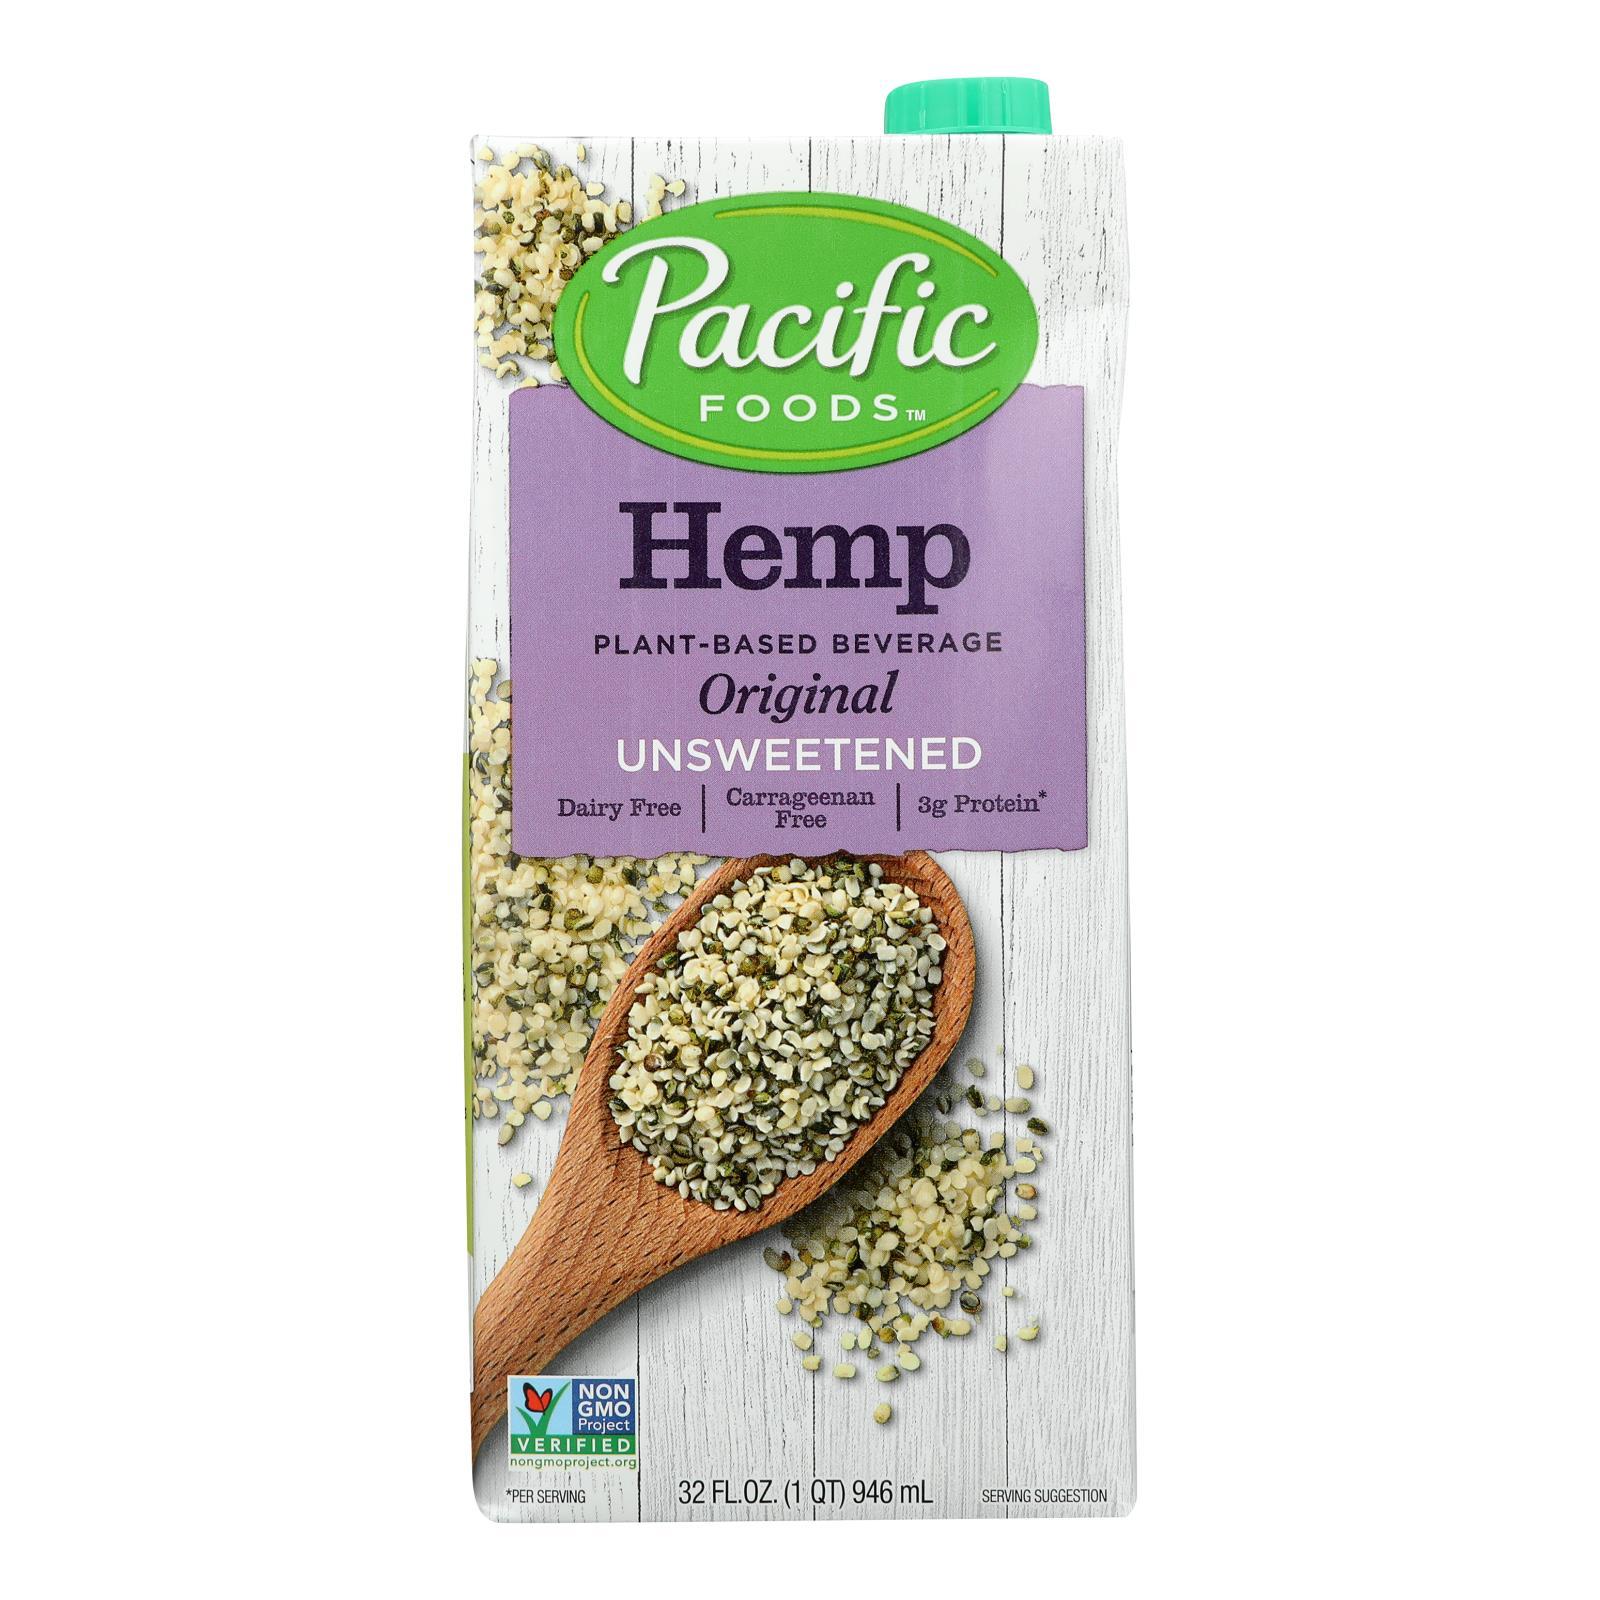 Pacific Natural Foods Hemp Original - Unsweetened - Case of 12 - 32 Fl oz.